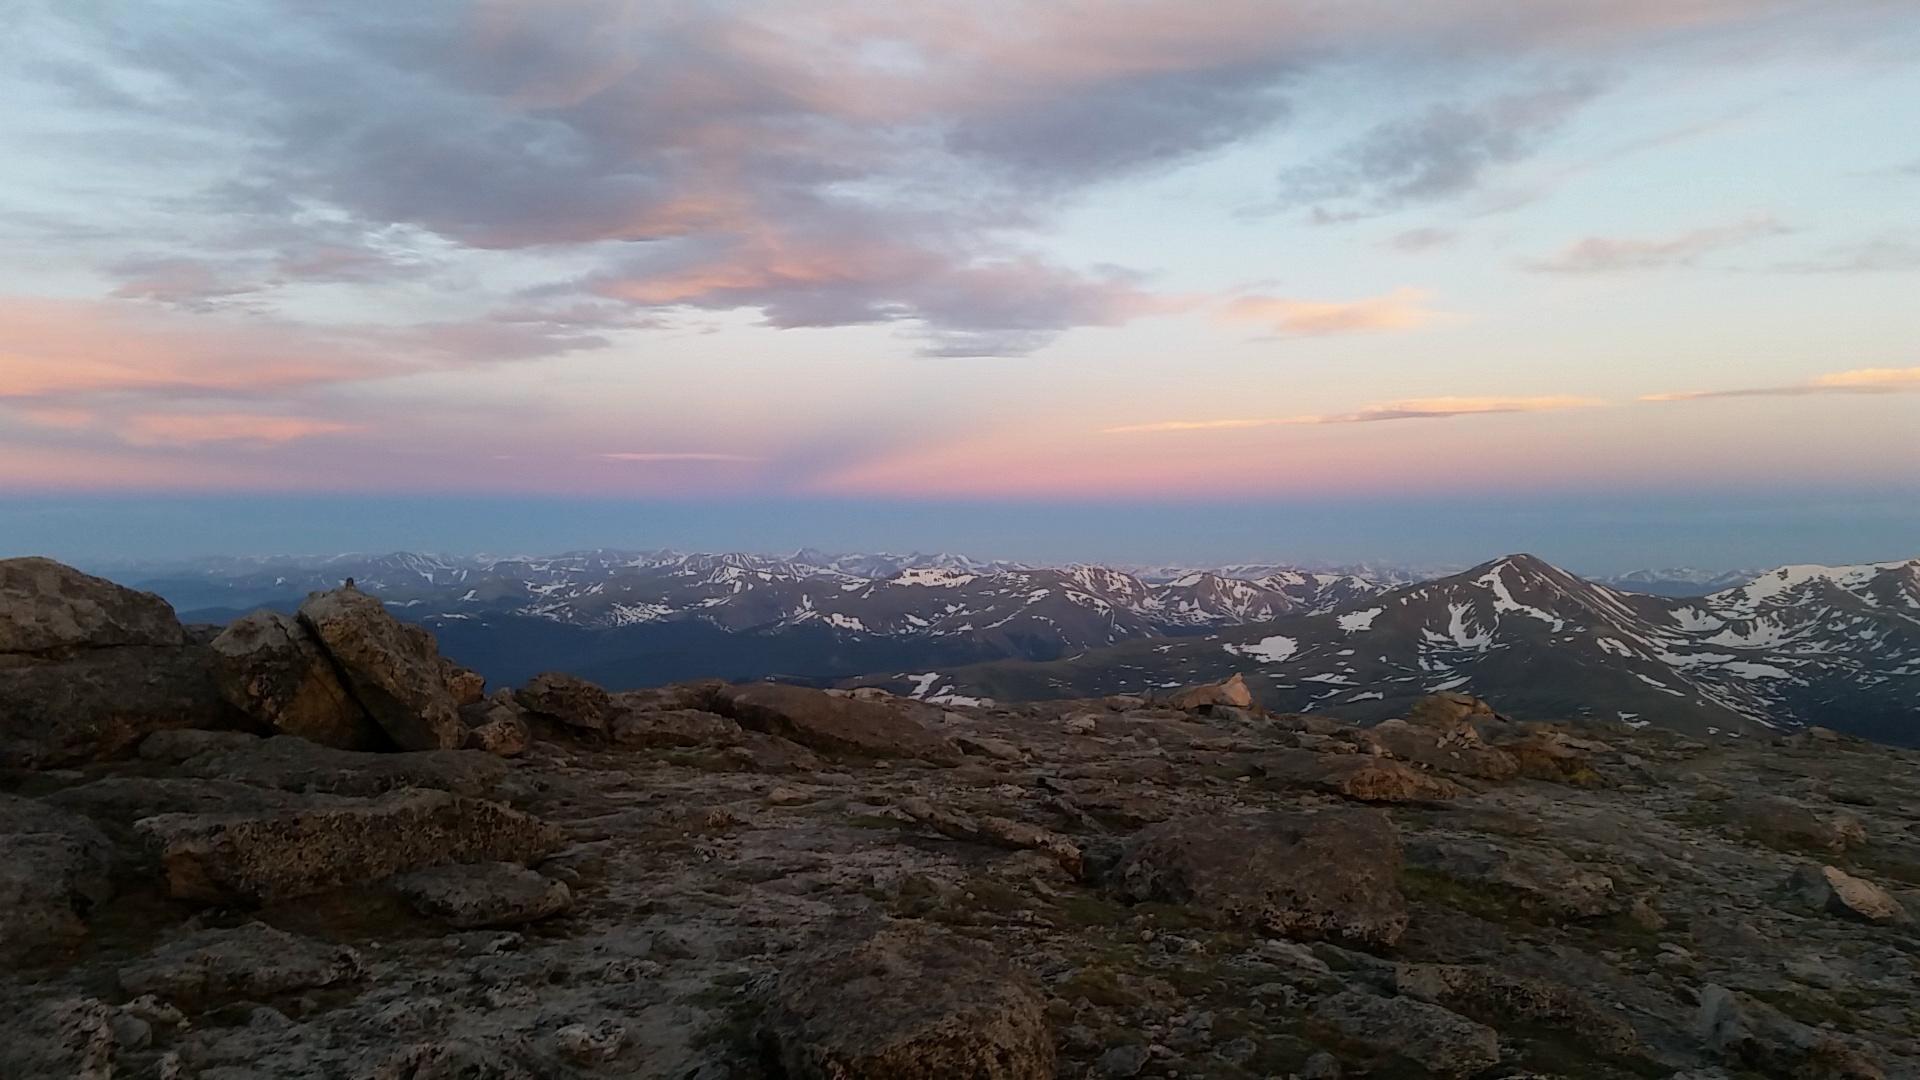 Cotton-Candy-Sunrise-Mt-Spalding-Colorado-Rockies-1080×1920-